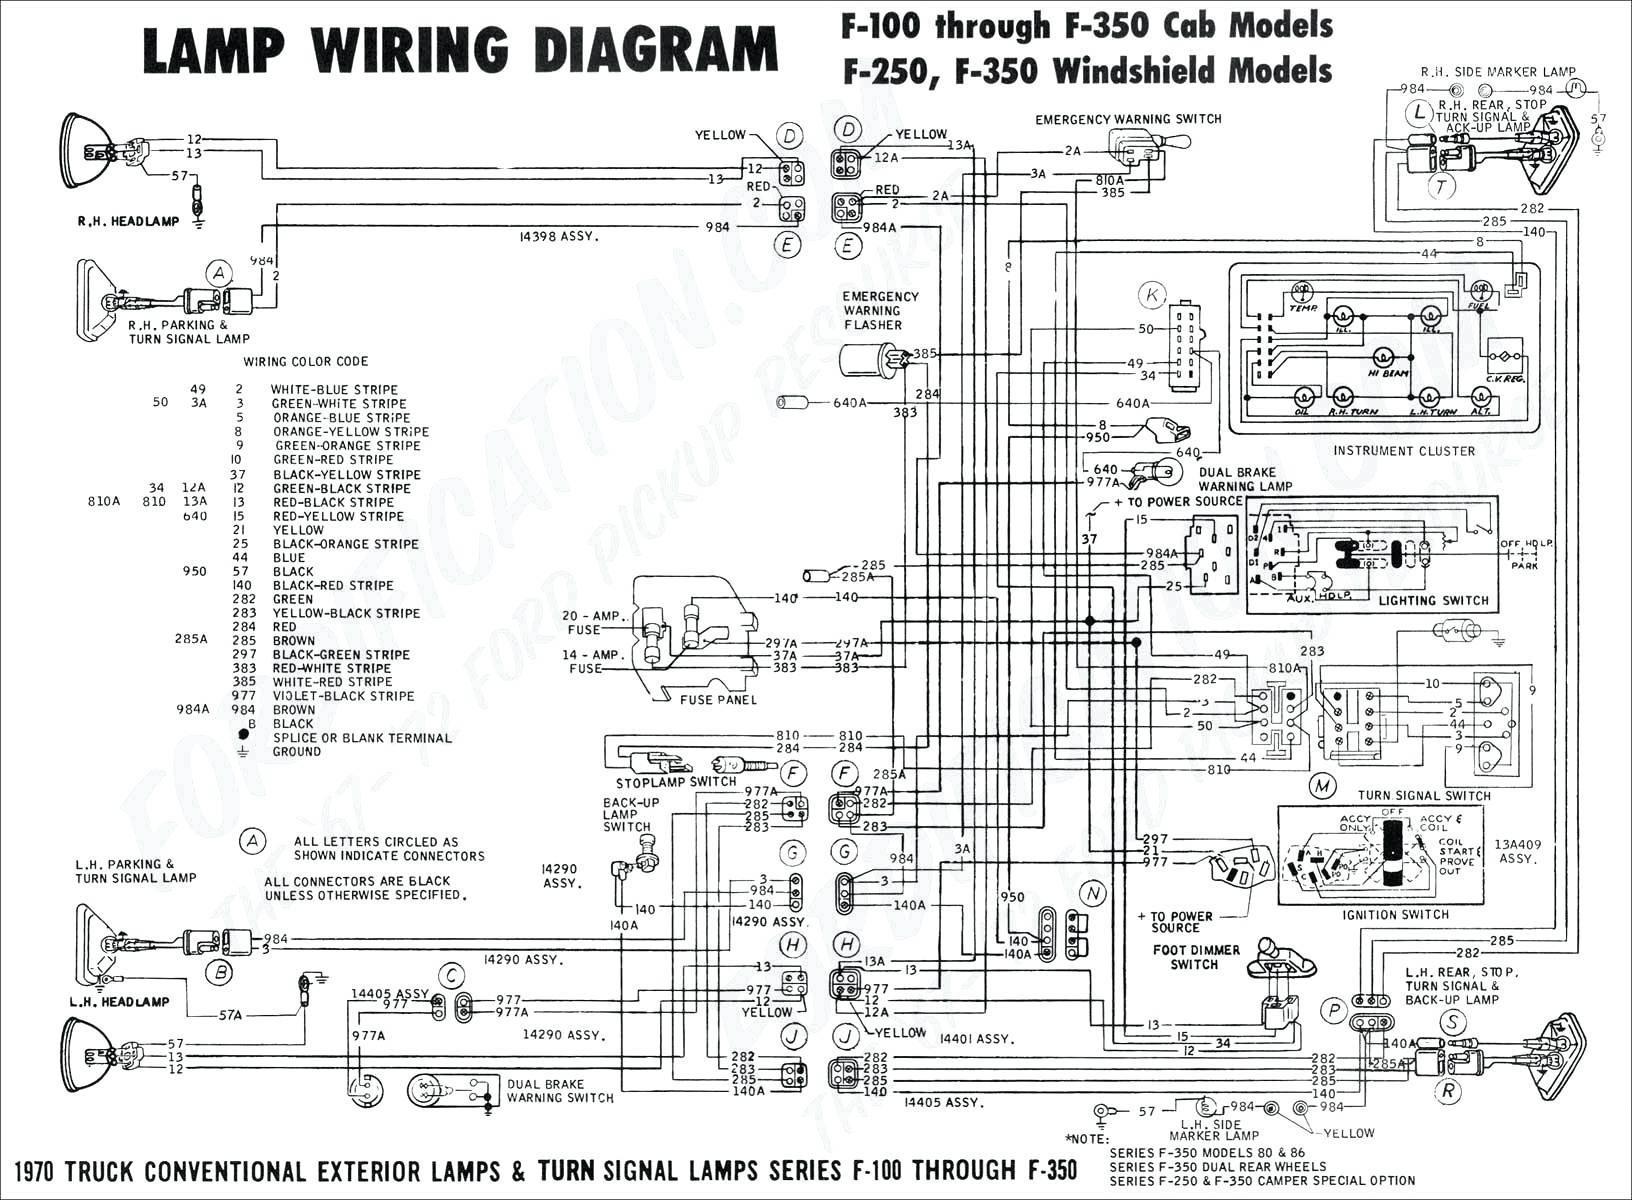 1987 Honda Accord Engine Diagram 2000 Honda Shadow Wiring Diagram Wiring Diagram toolbox Of 1987 Honda Accord Engine Diagram